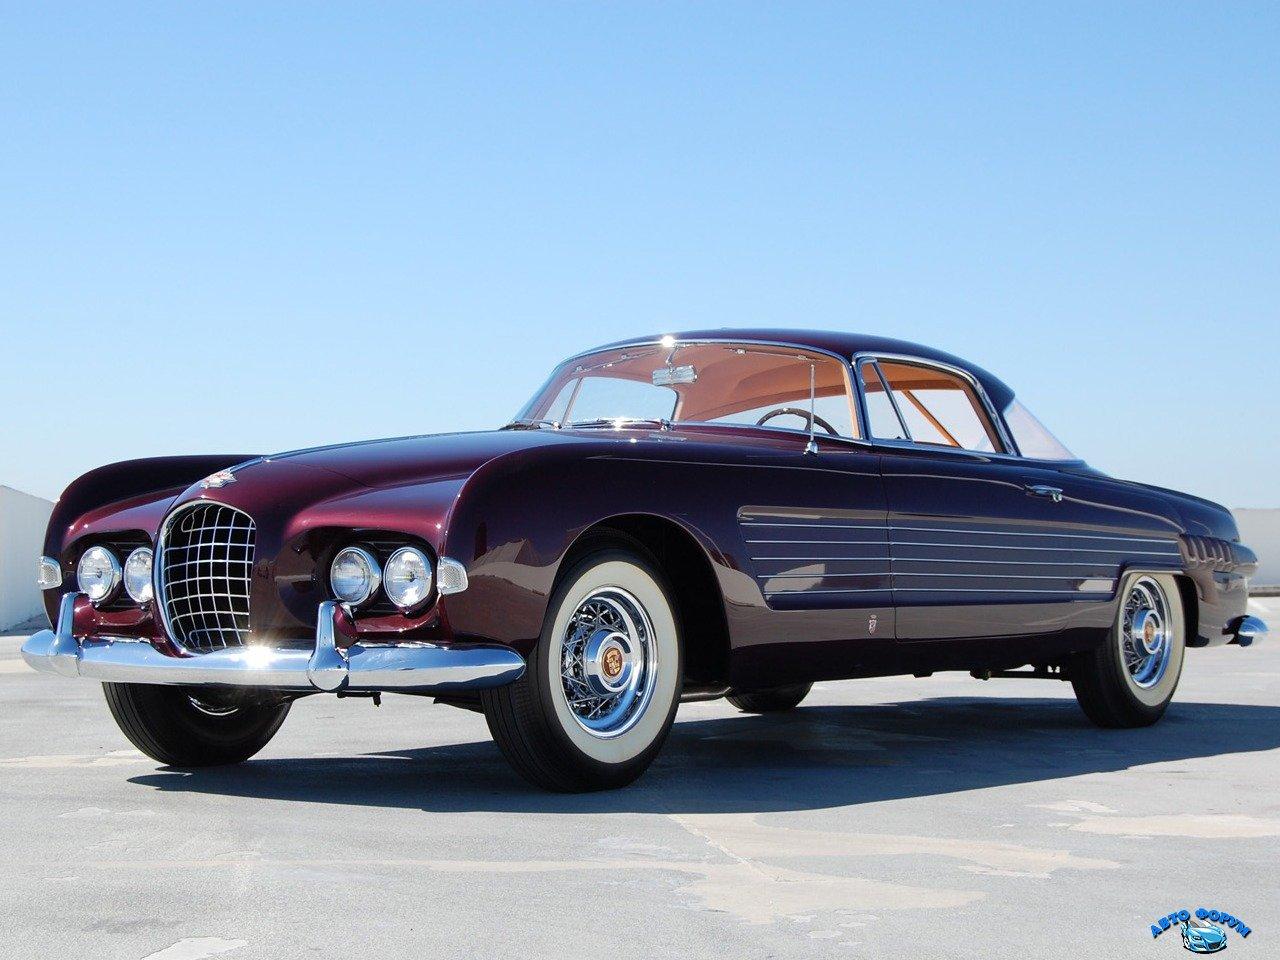 1953_Ghia_Cadillac_Coupe_(Rita_Hayworth)_01.jpg